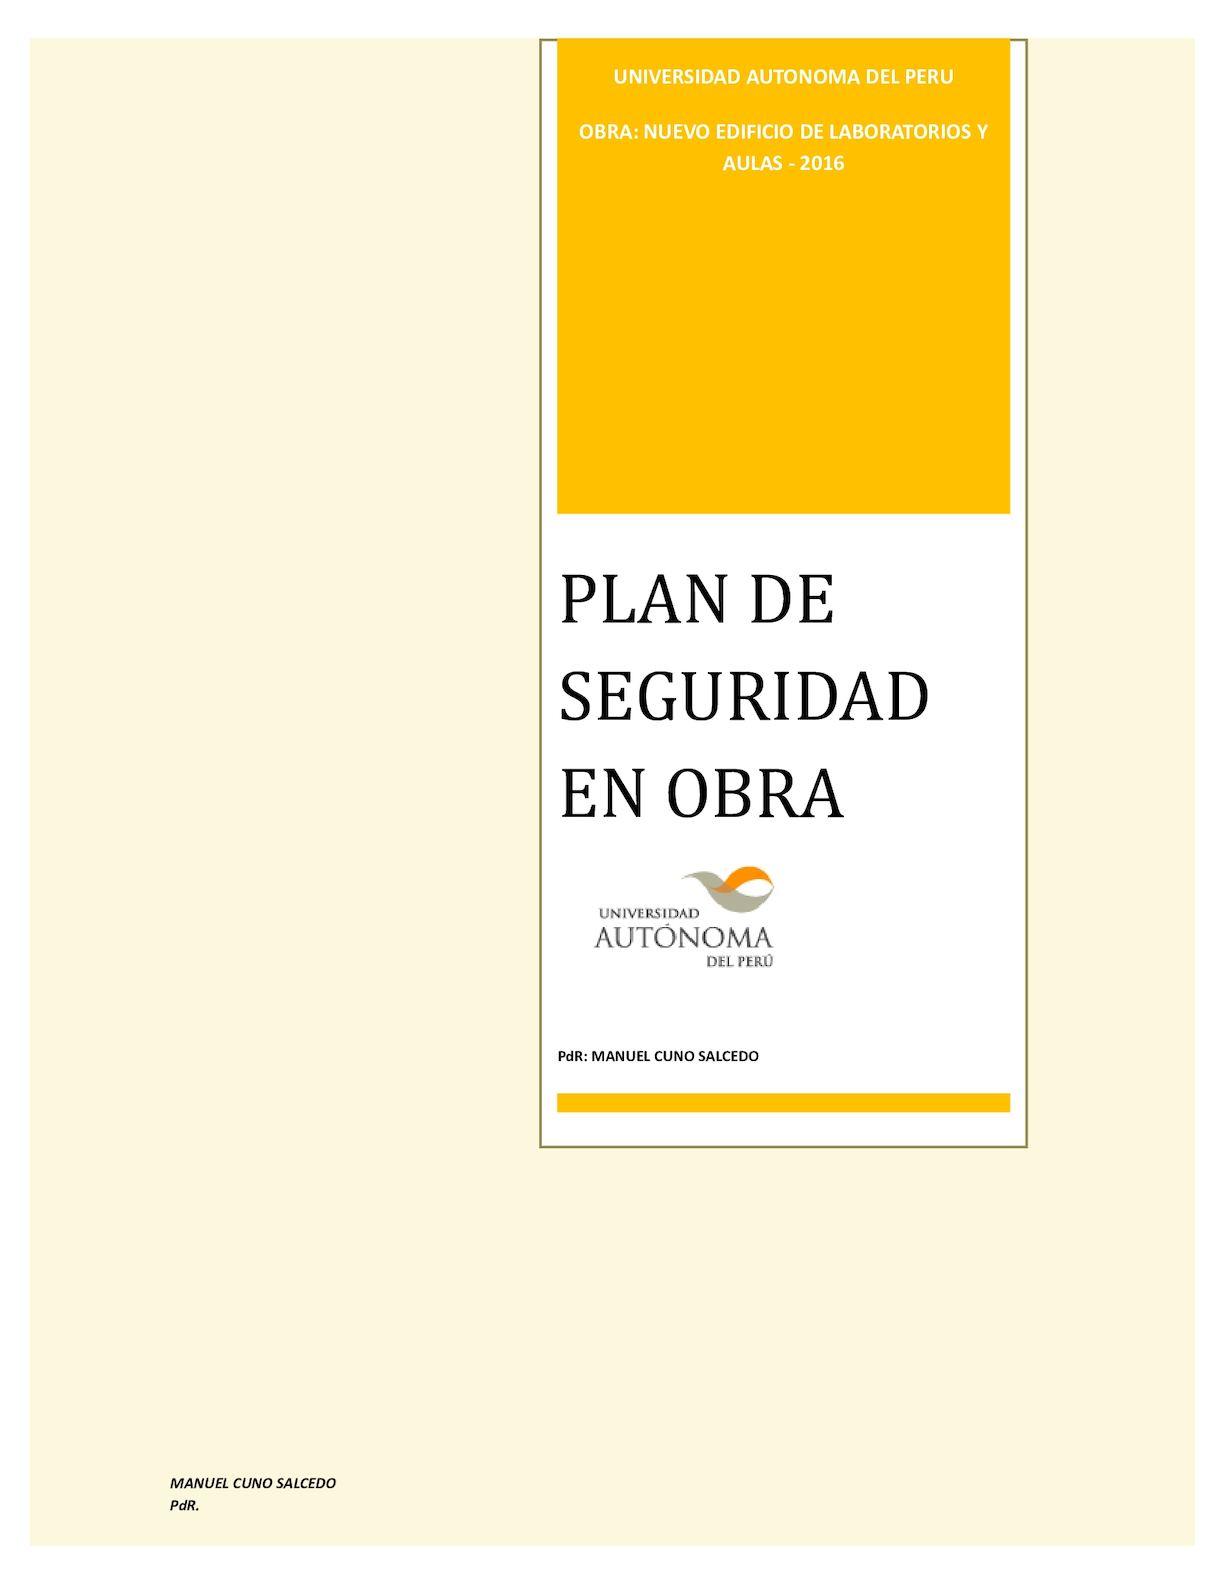 Calaméo - Plan De Seguridad Obra 2016